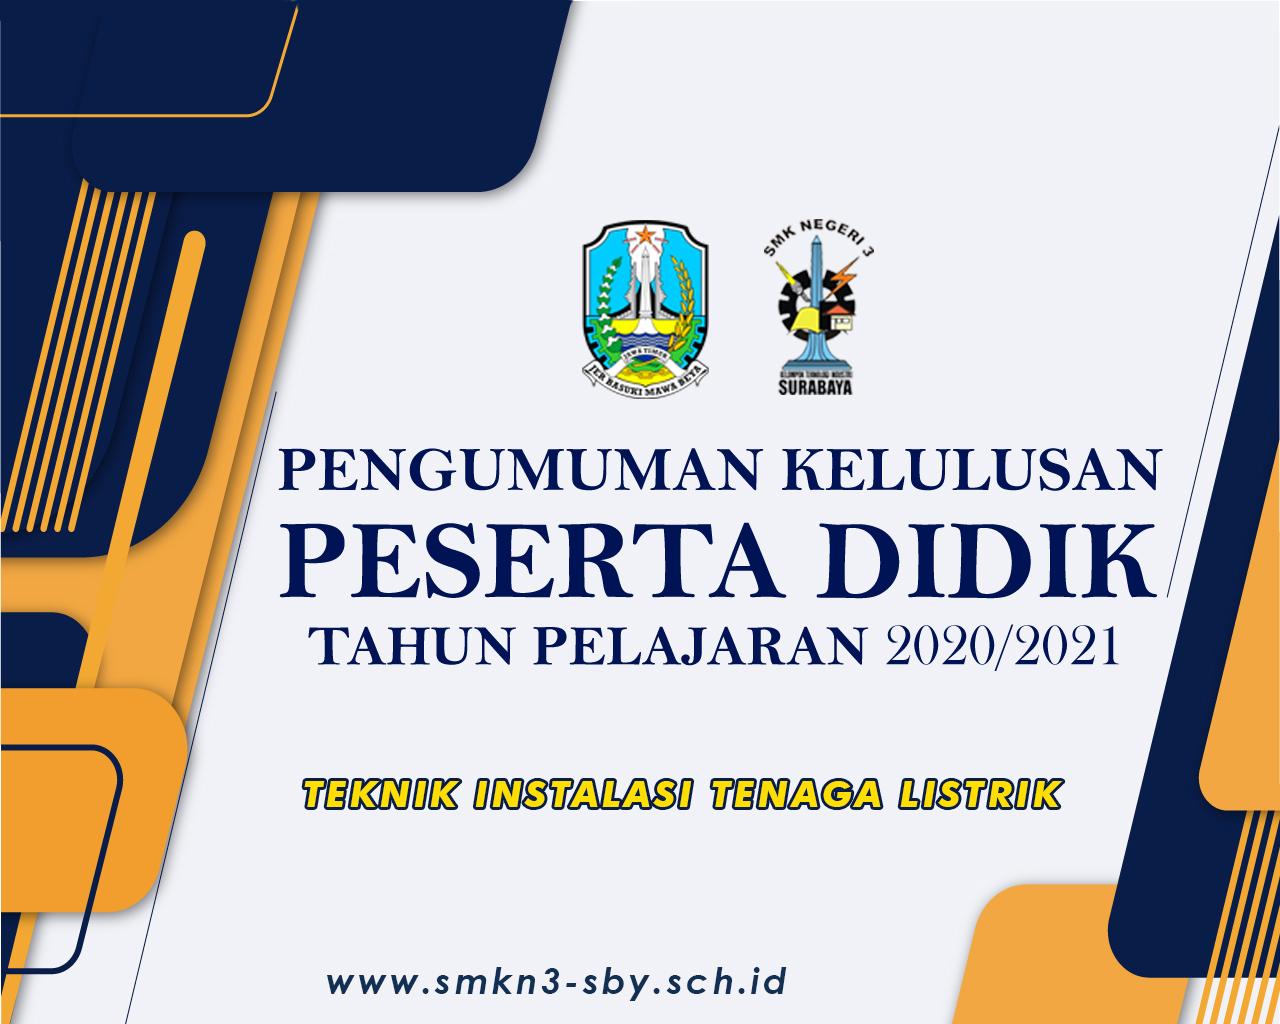 TEKNIK INSTALASI TENAGA LISTRIK 2020/2021